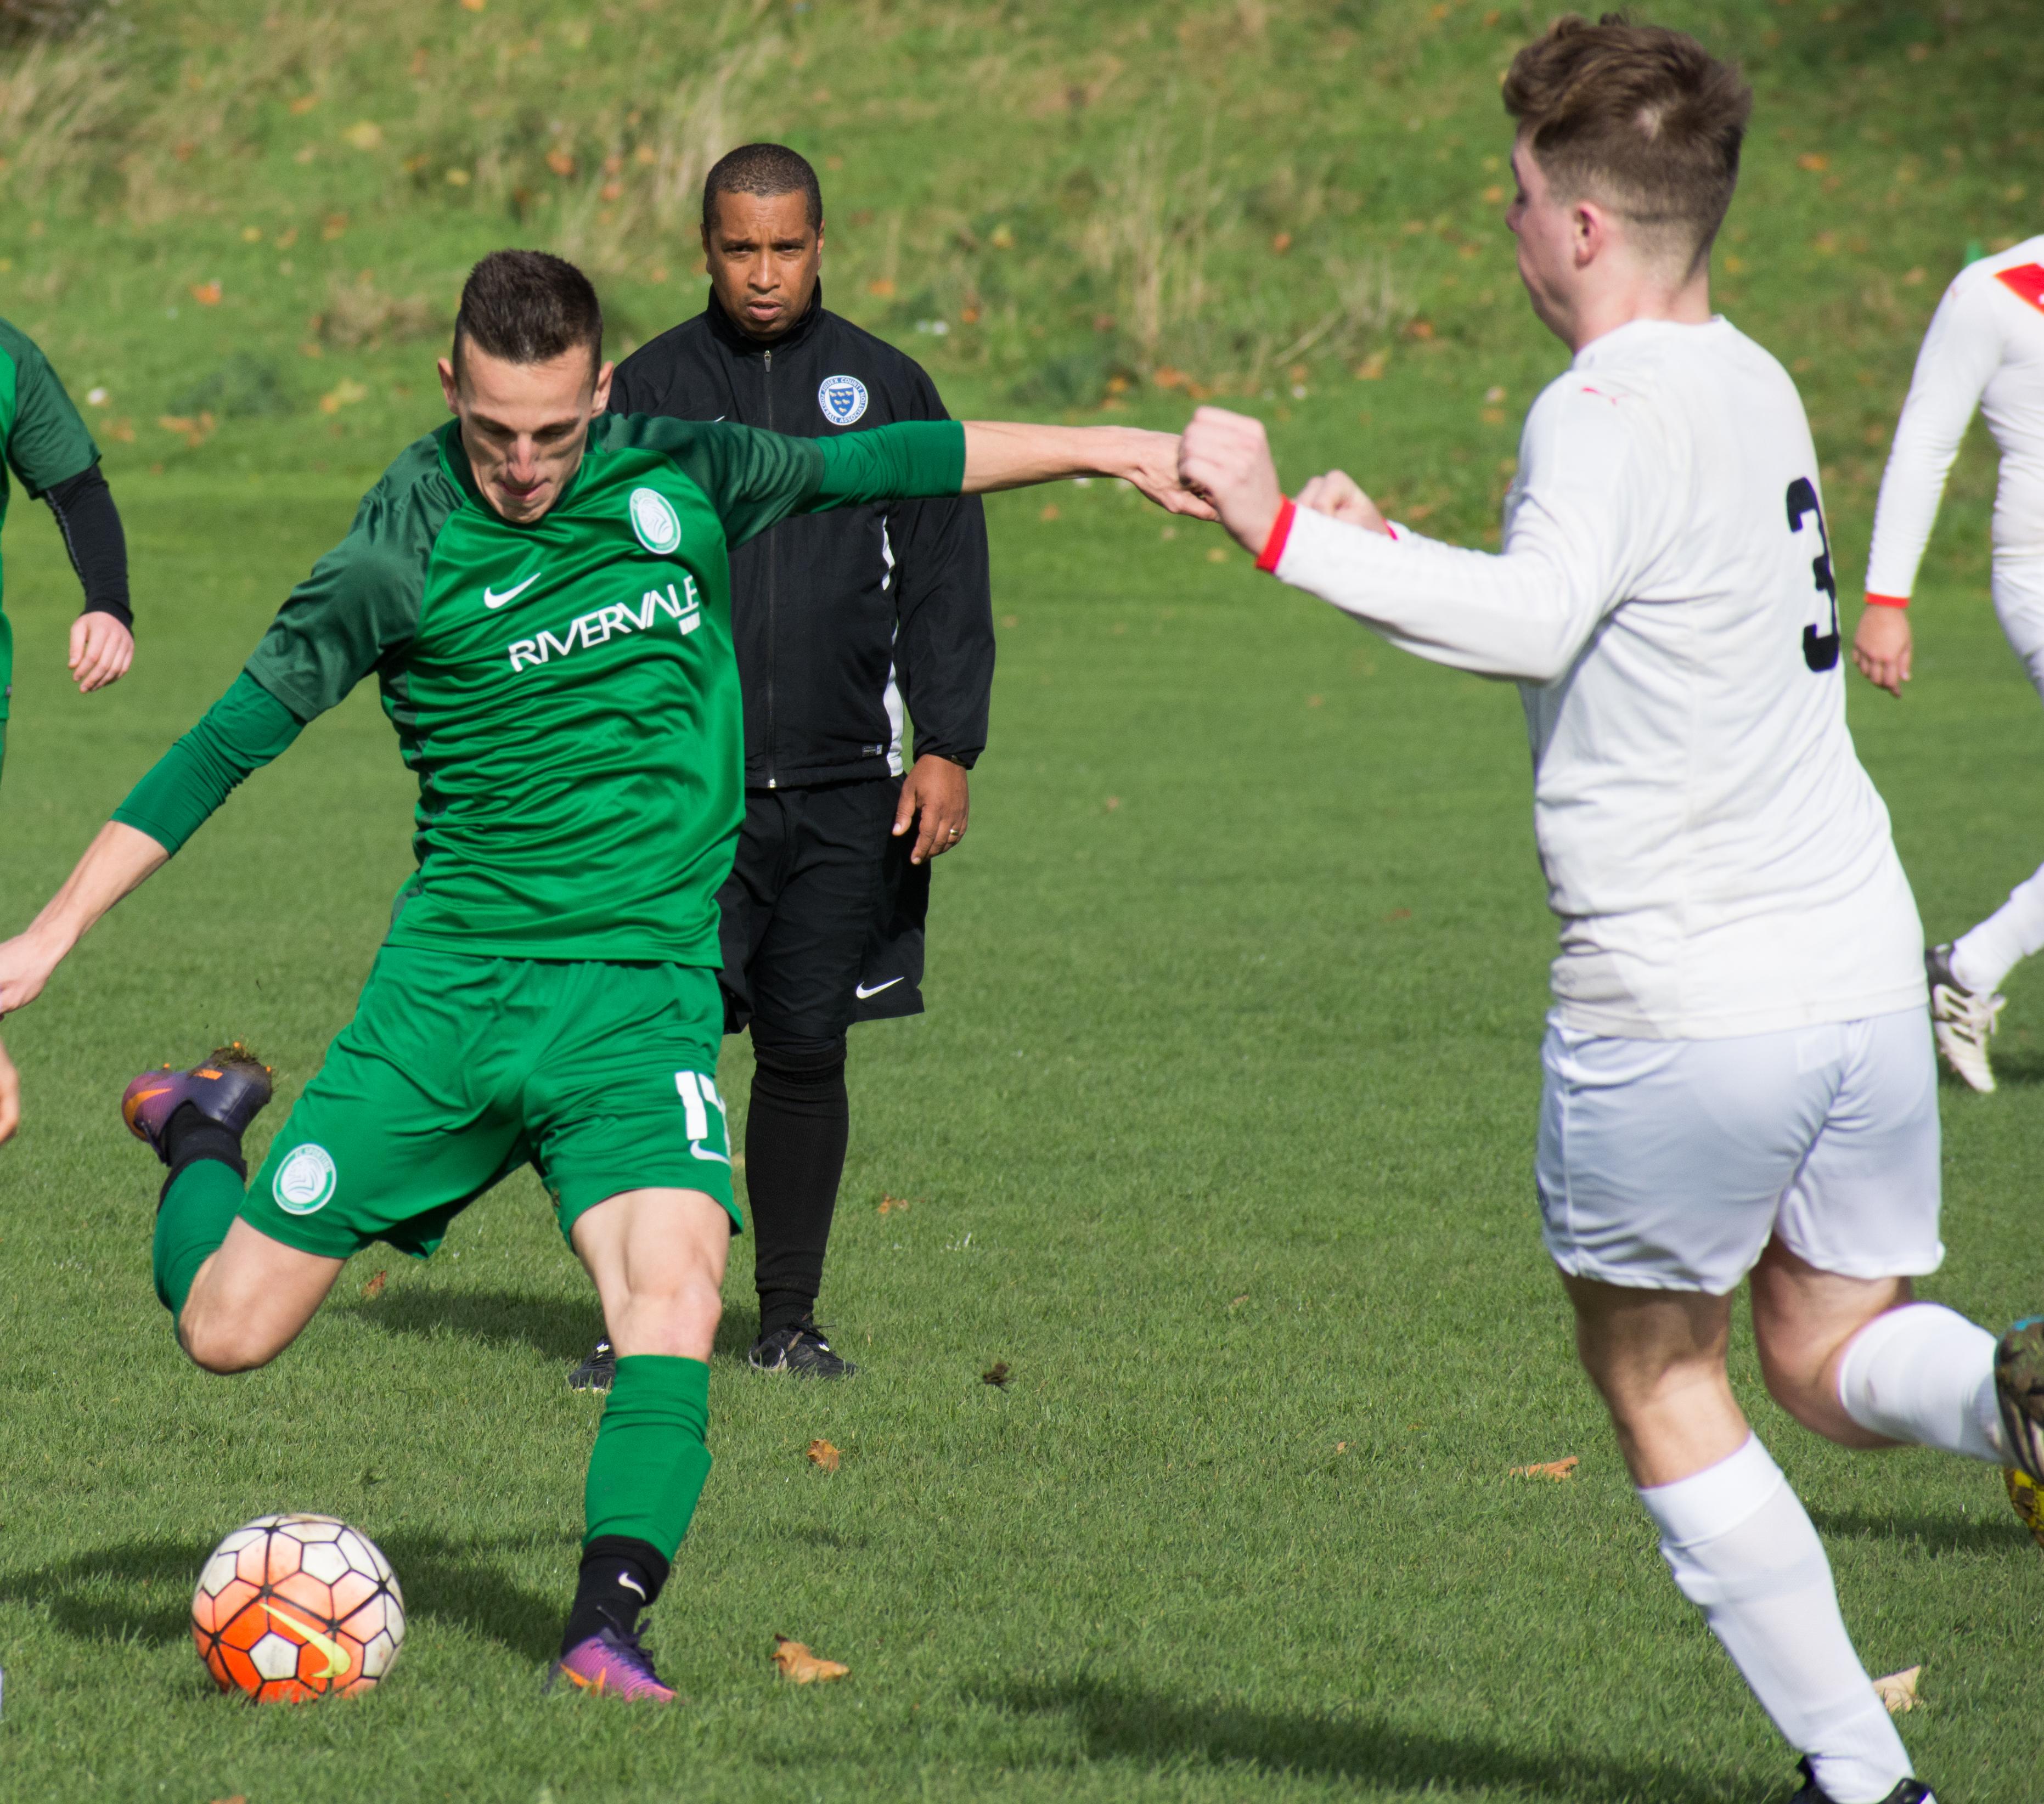 FC Sporting vs Brighton Lights 21.10.17 05